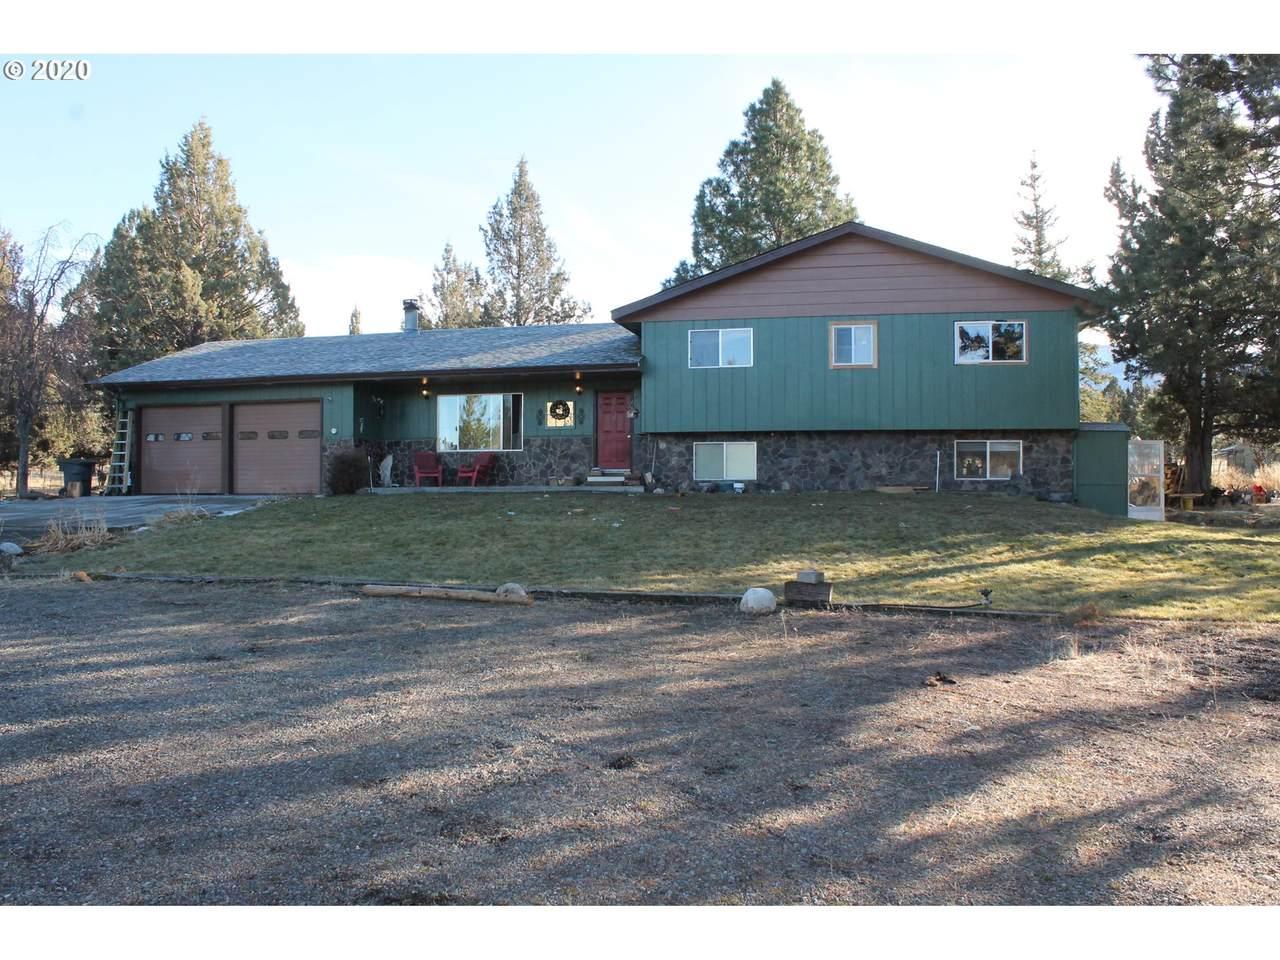 27575 Pine Creek Rd - Photo 1